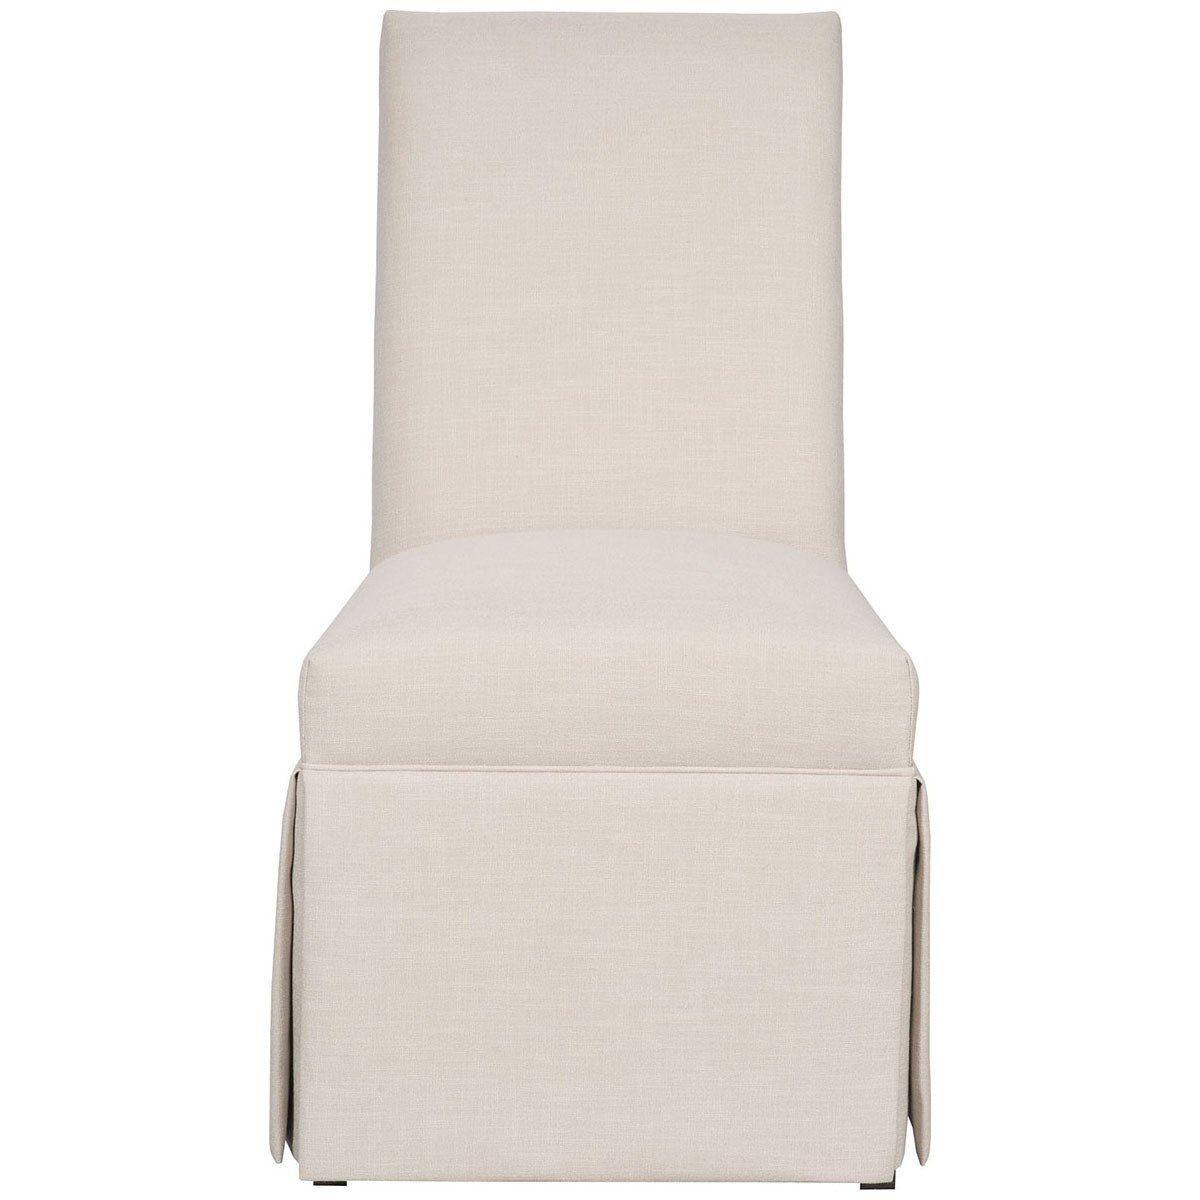 Vanguard Furniture Novella Pumice Butler Skirted Side Chair  # Muebles Novella